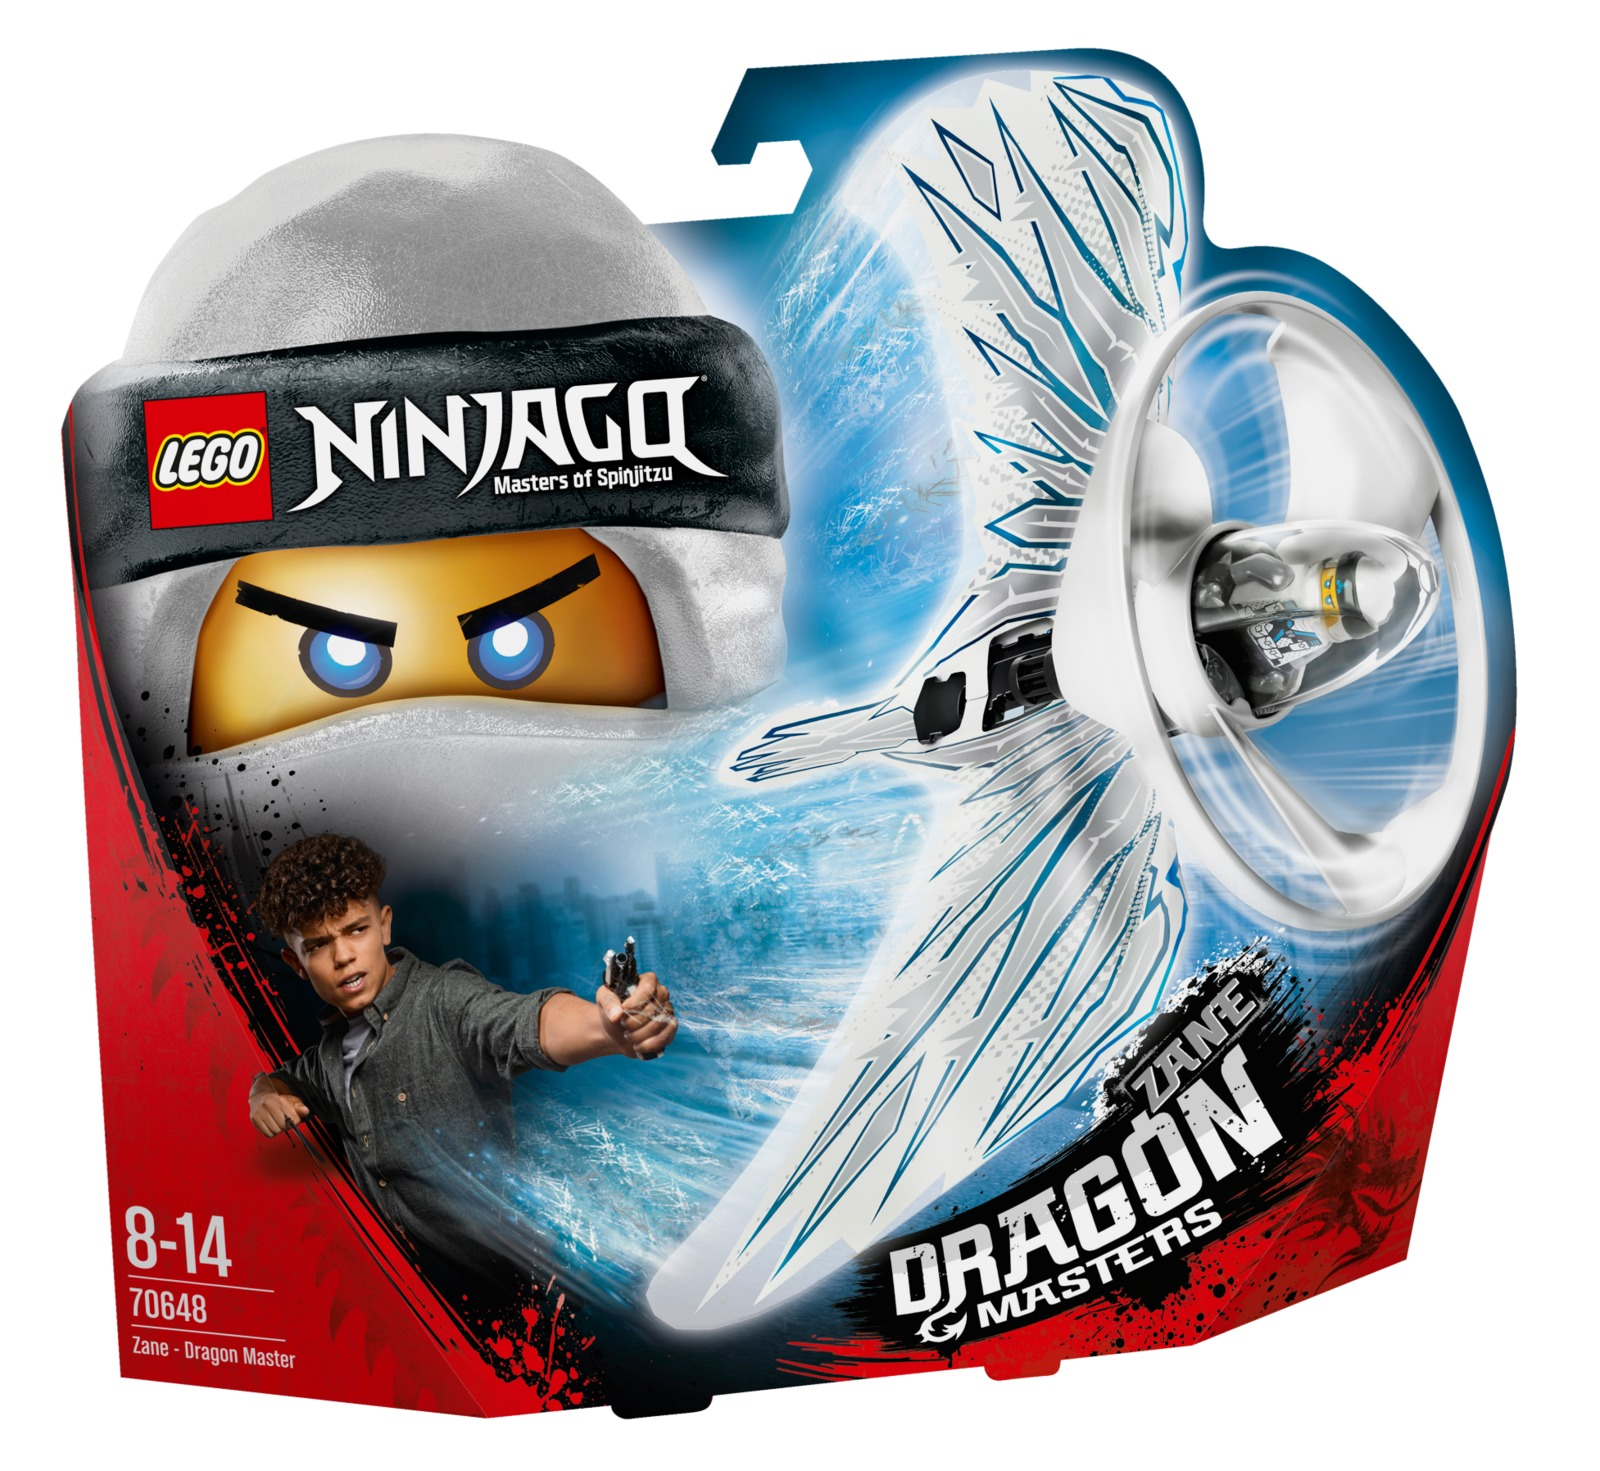 LEGO Ninjago - Zane Dragon Master (70648) image